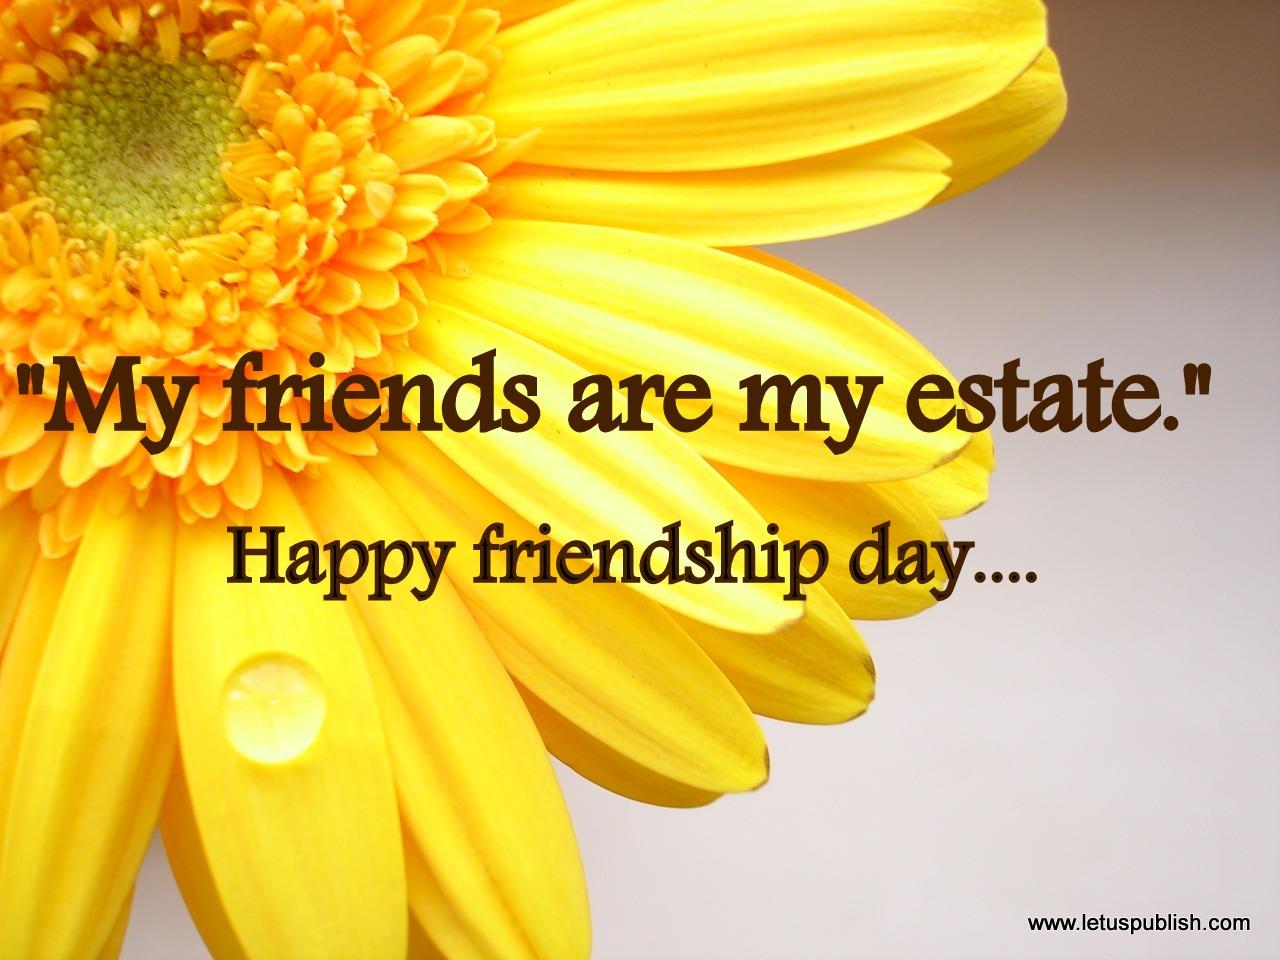 Happy friendship day yellow flower wallpaper